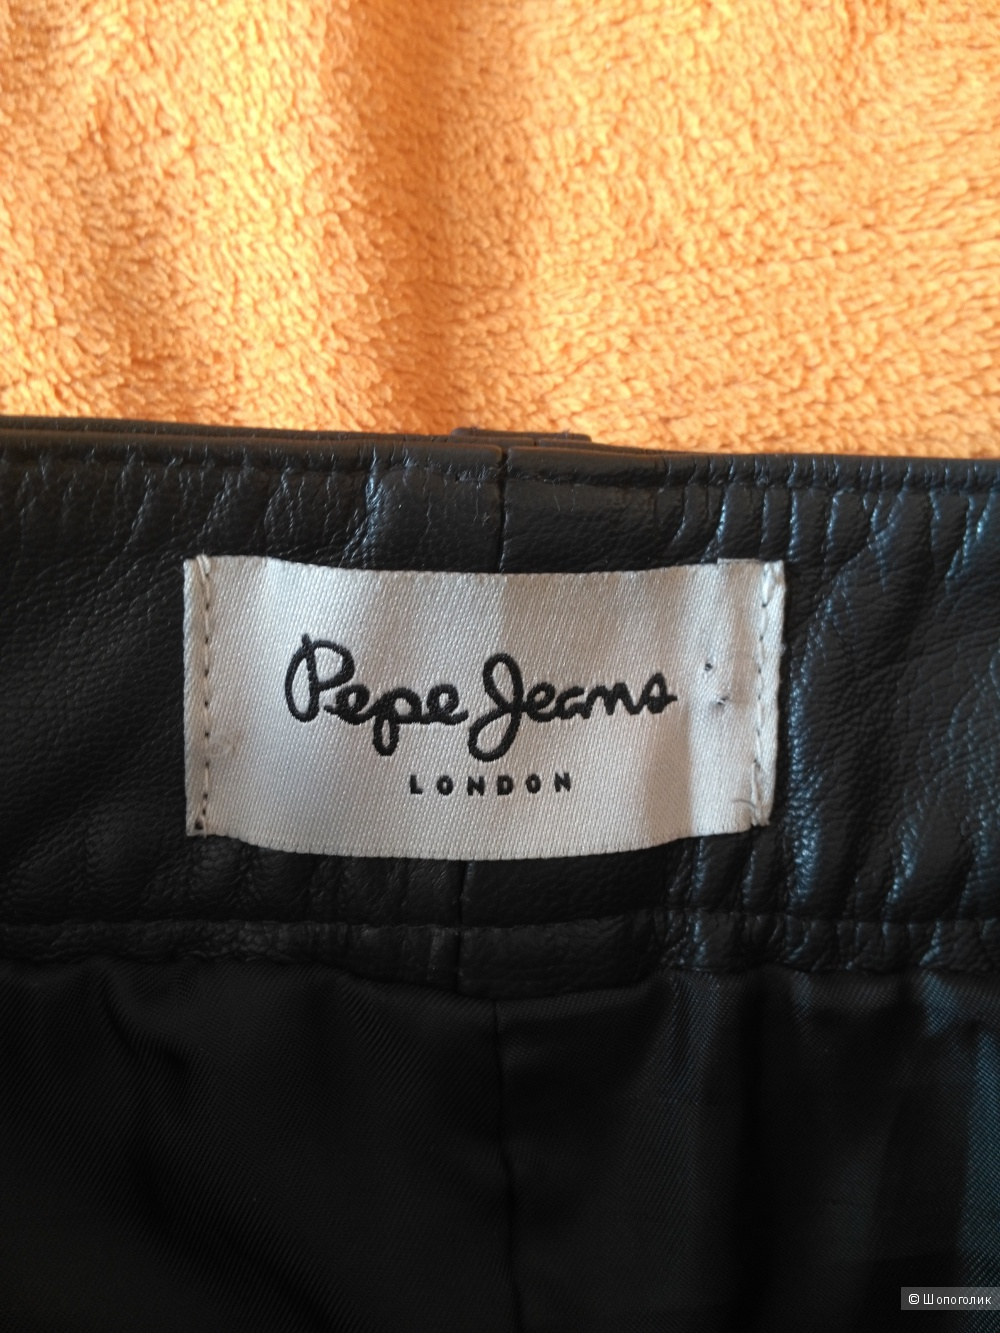 Юбка Pepe Jeans  S размер